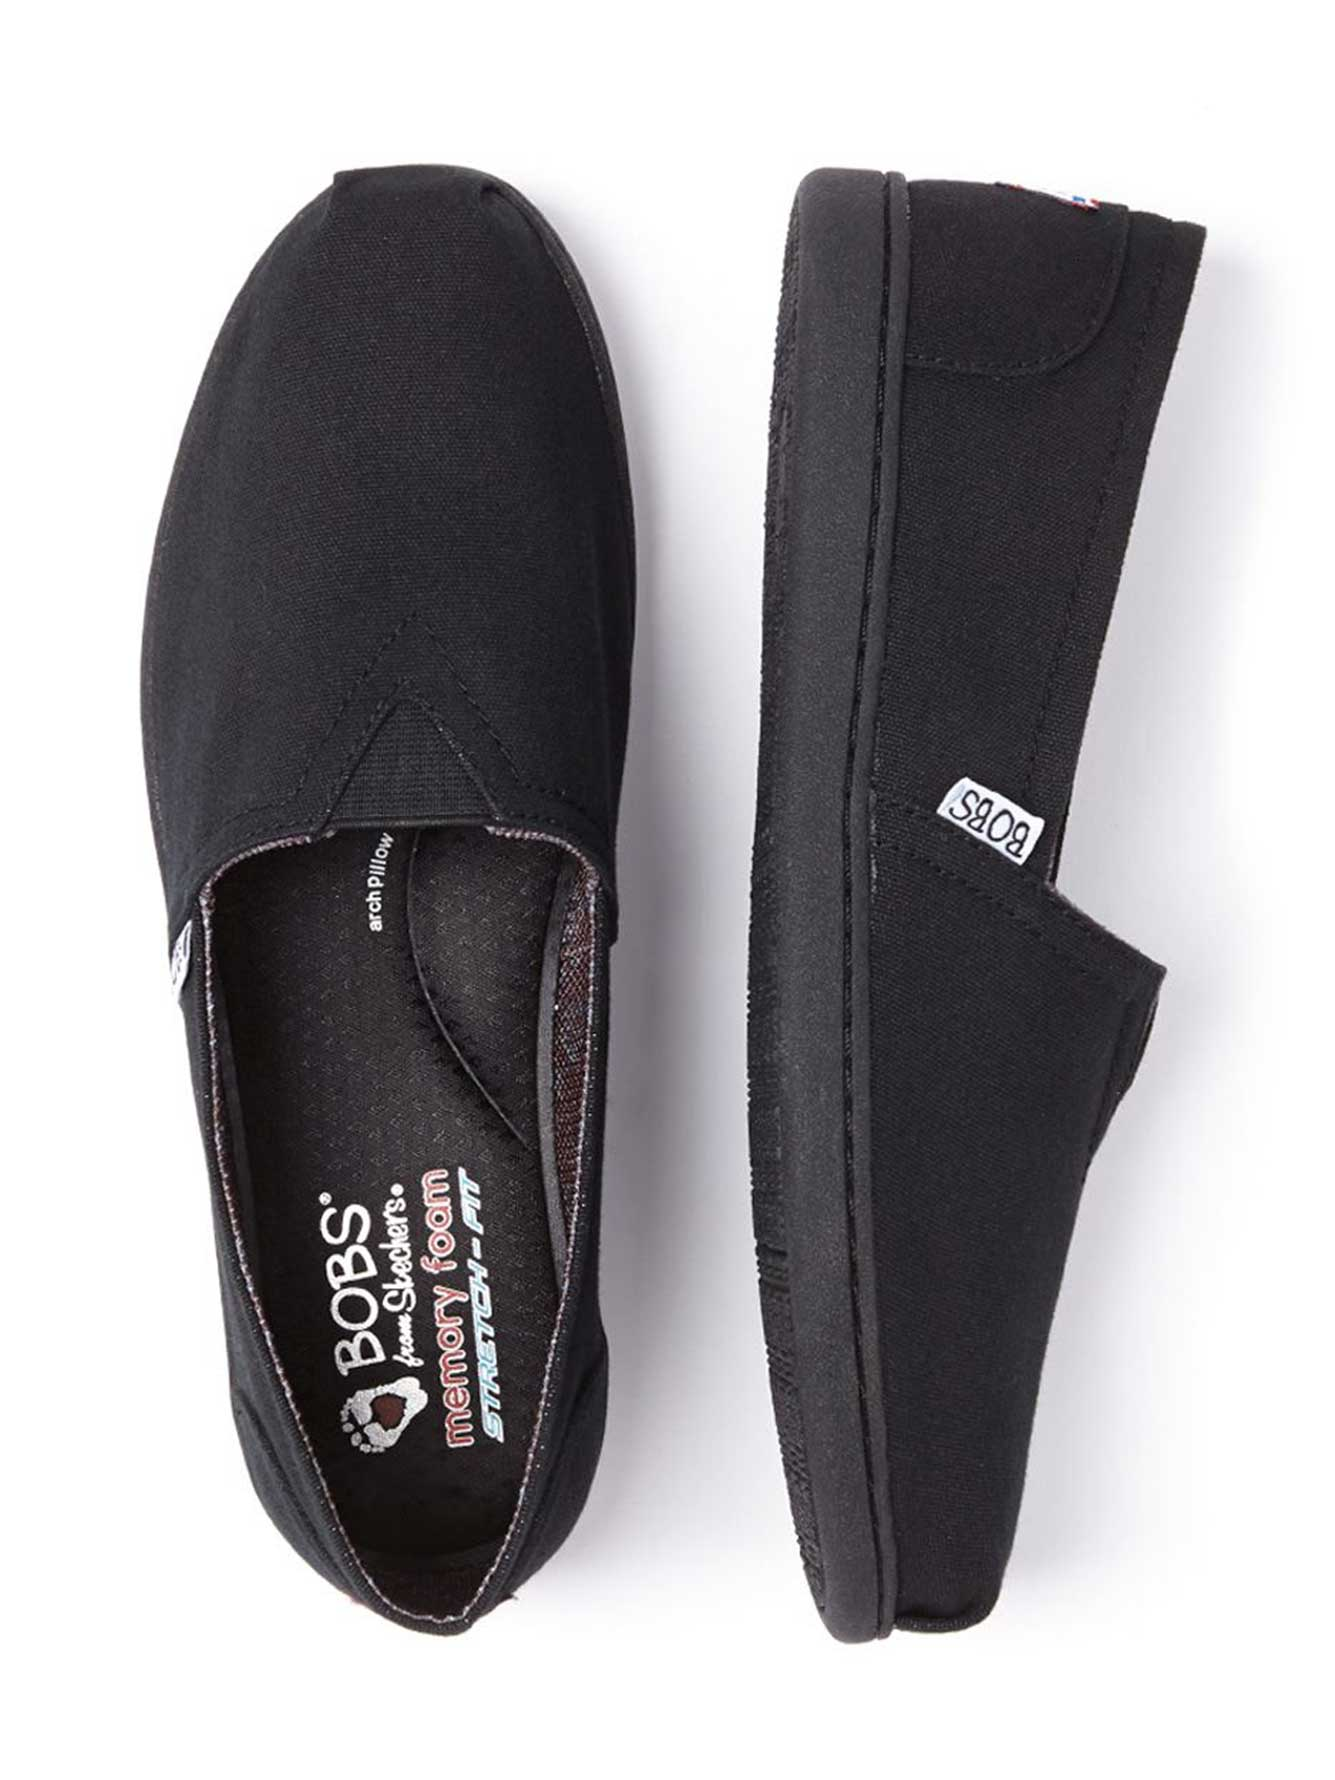 Bobs From Skechers Wide Width Slip On Shoes